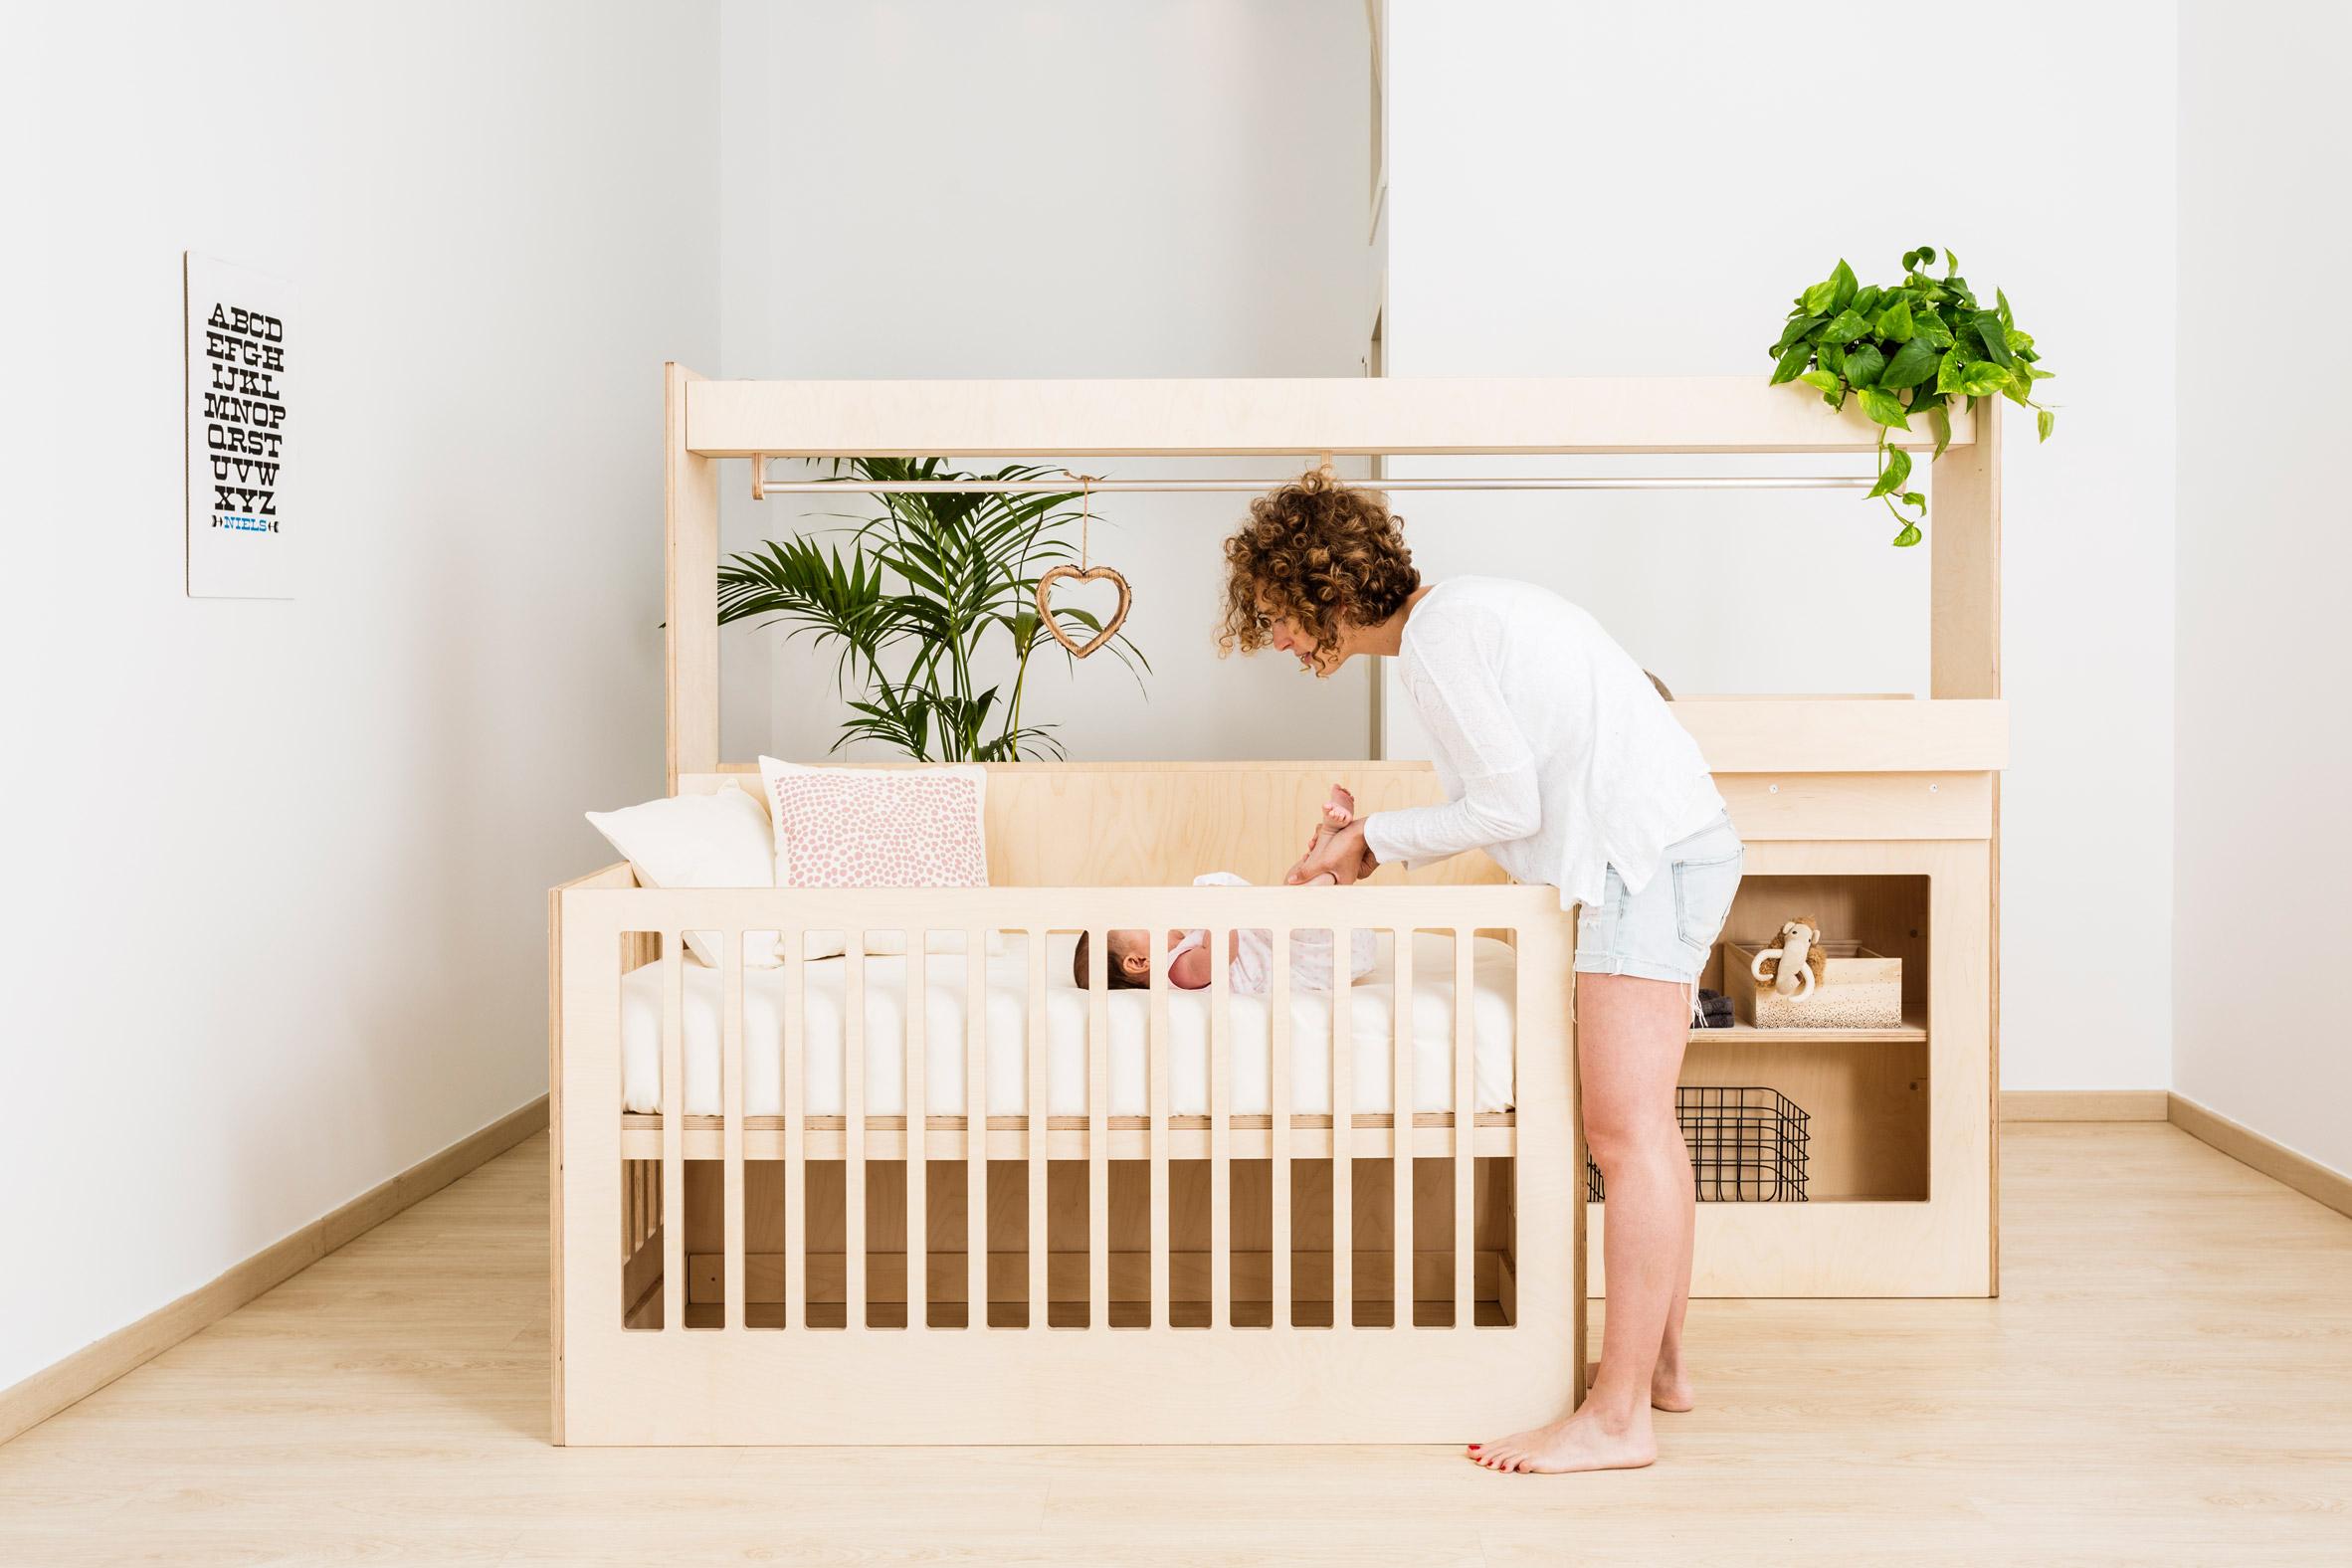 teehee-kids-furniture-europe-plywood-textiles_dezeen_2364_col_1